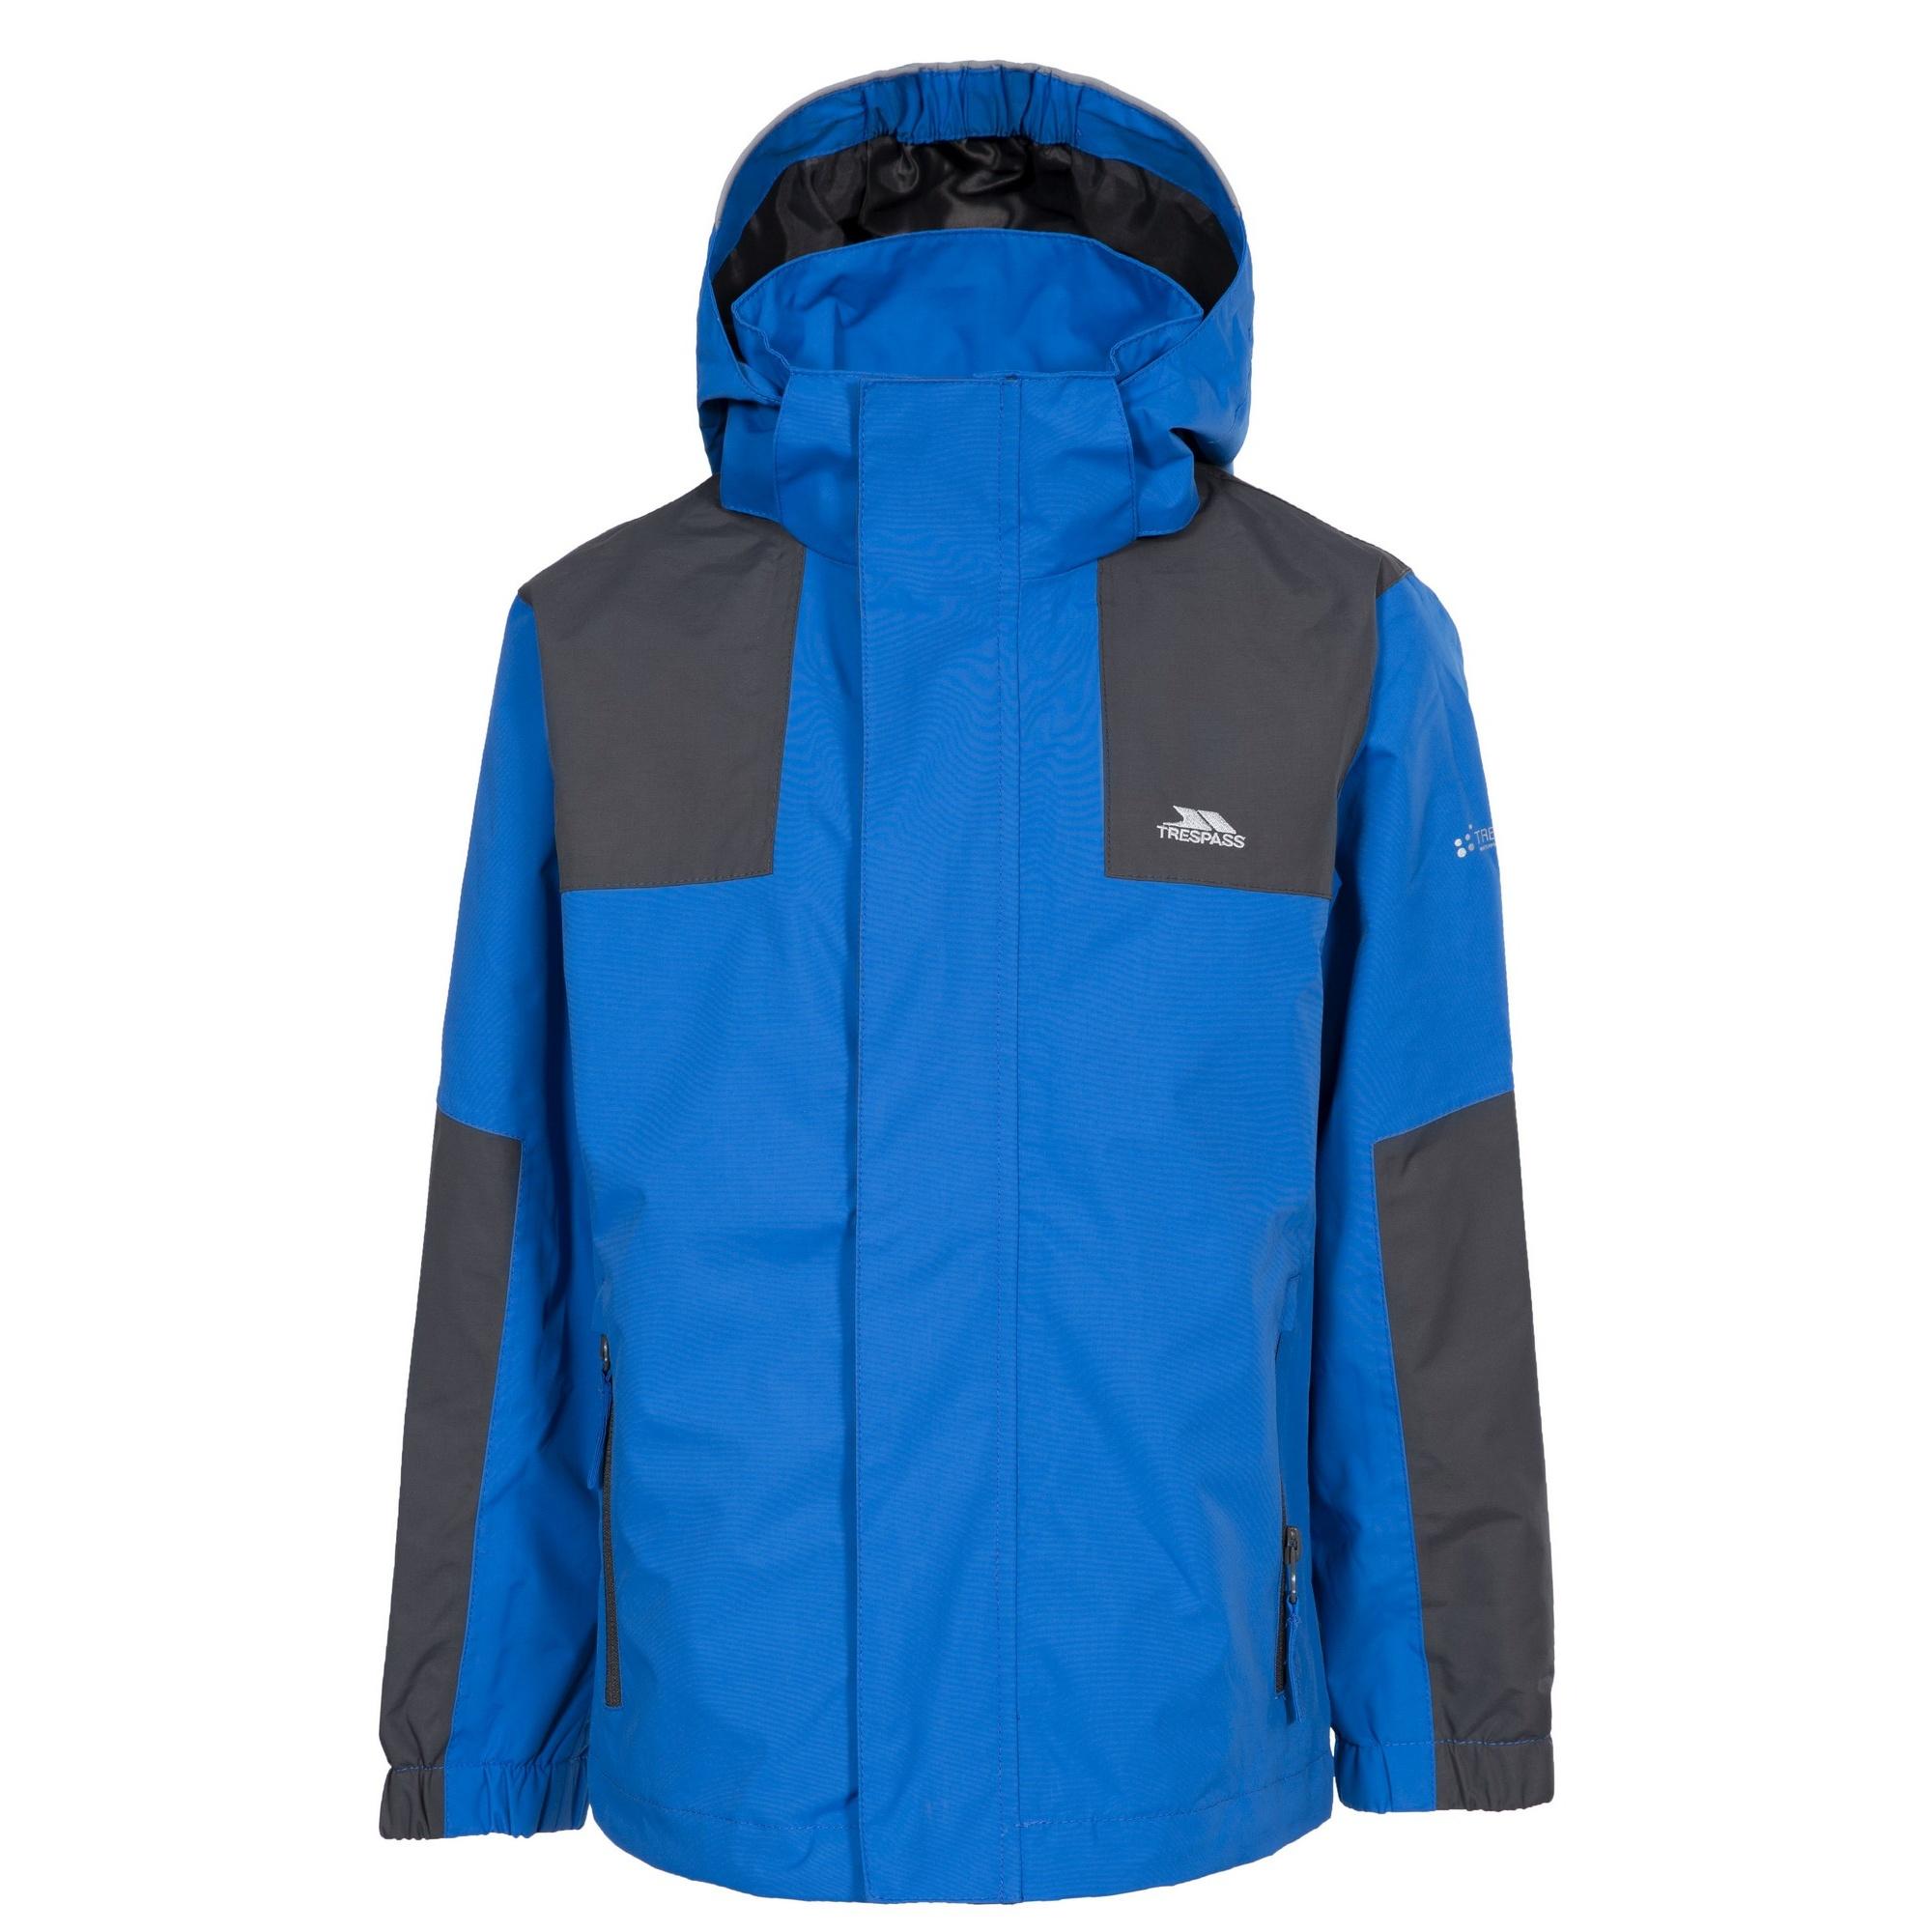 Trespass Childrens Boys Farpost Waterproof Jacket (5/6 Years) (Blue)